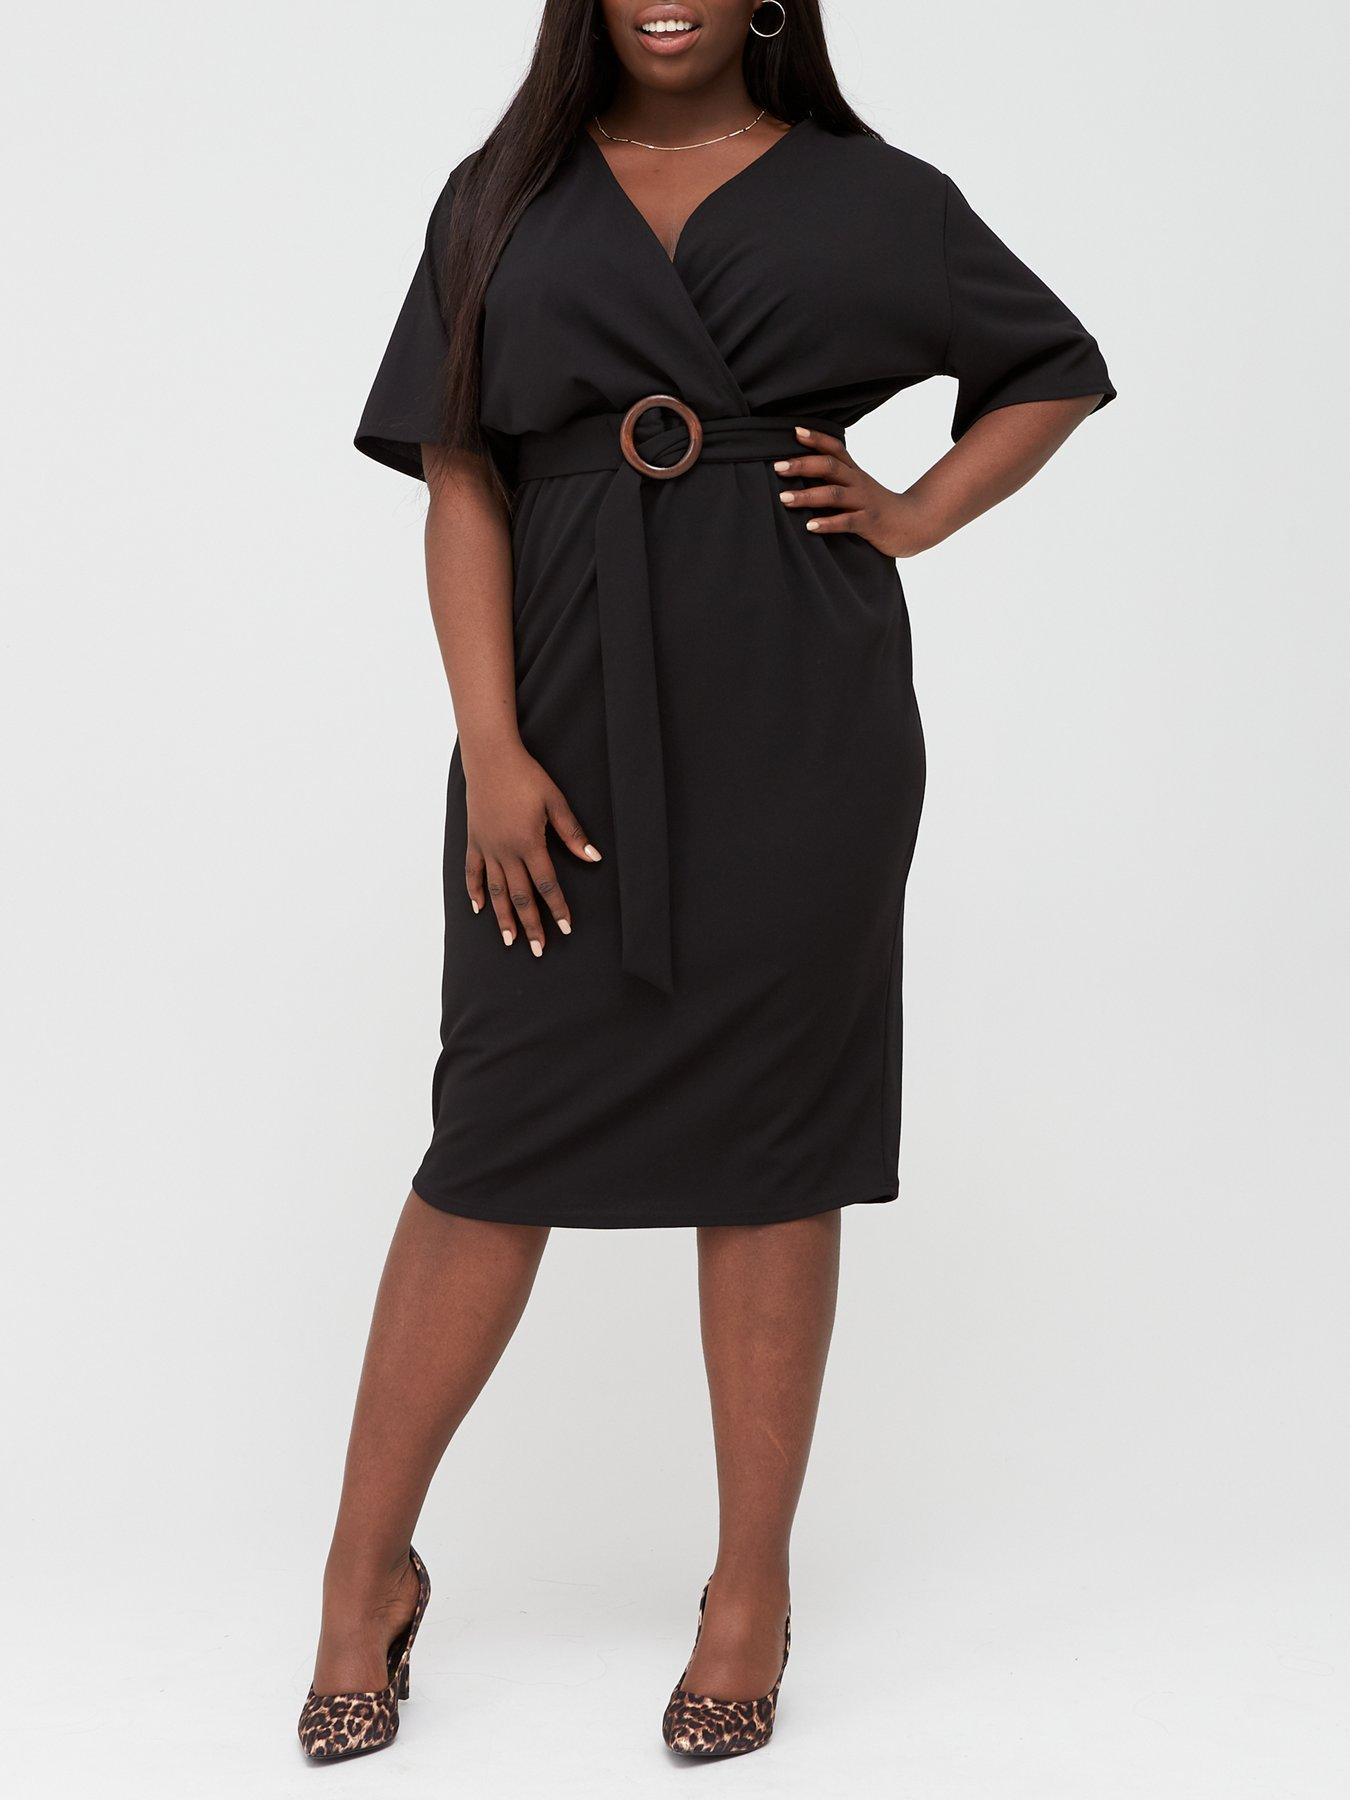 New Womens Plus Size V Neck Jersey Wrap Flared Skater Dress 16-22